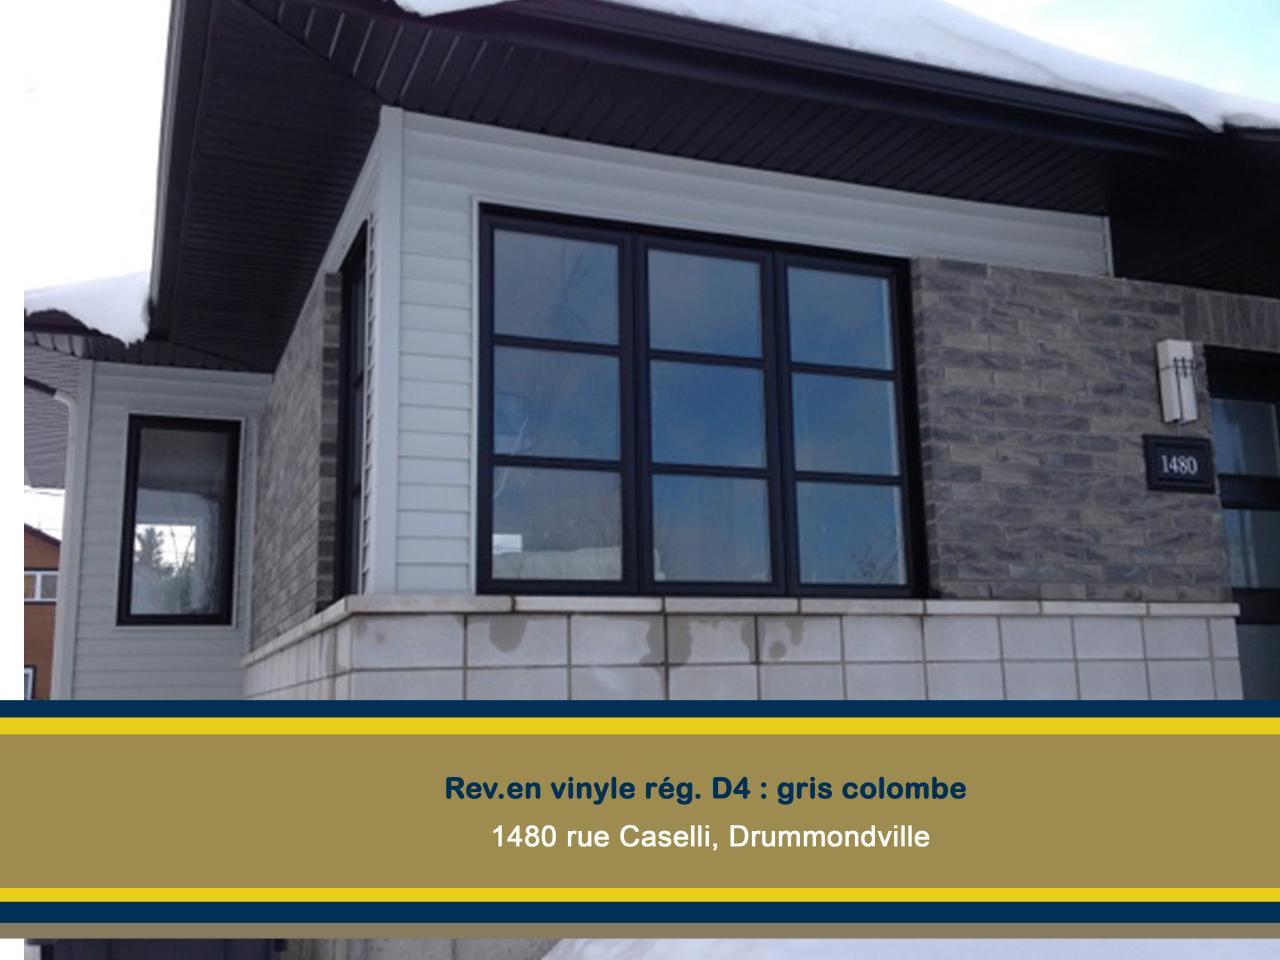 1480 rue Caselli Drummondville